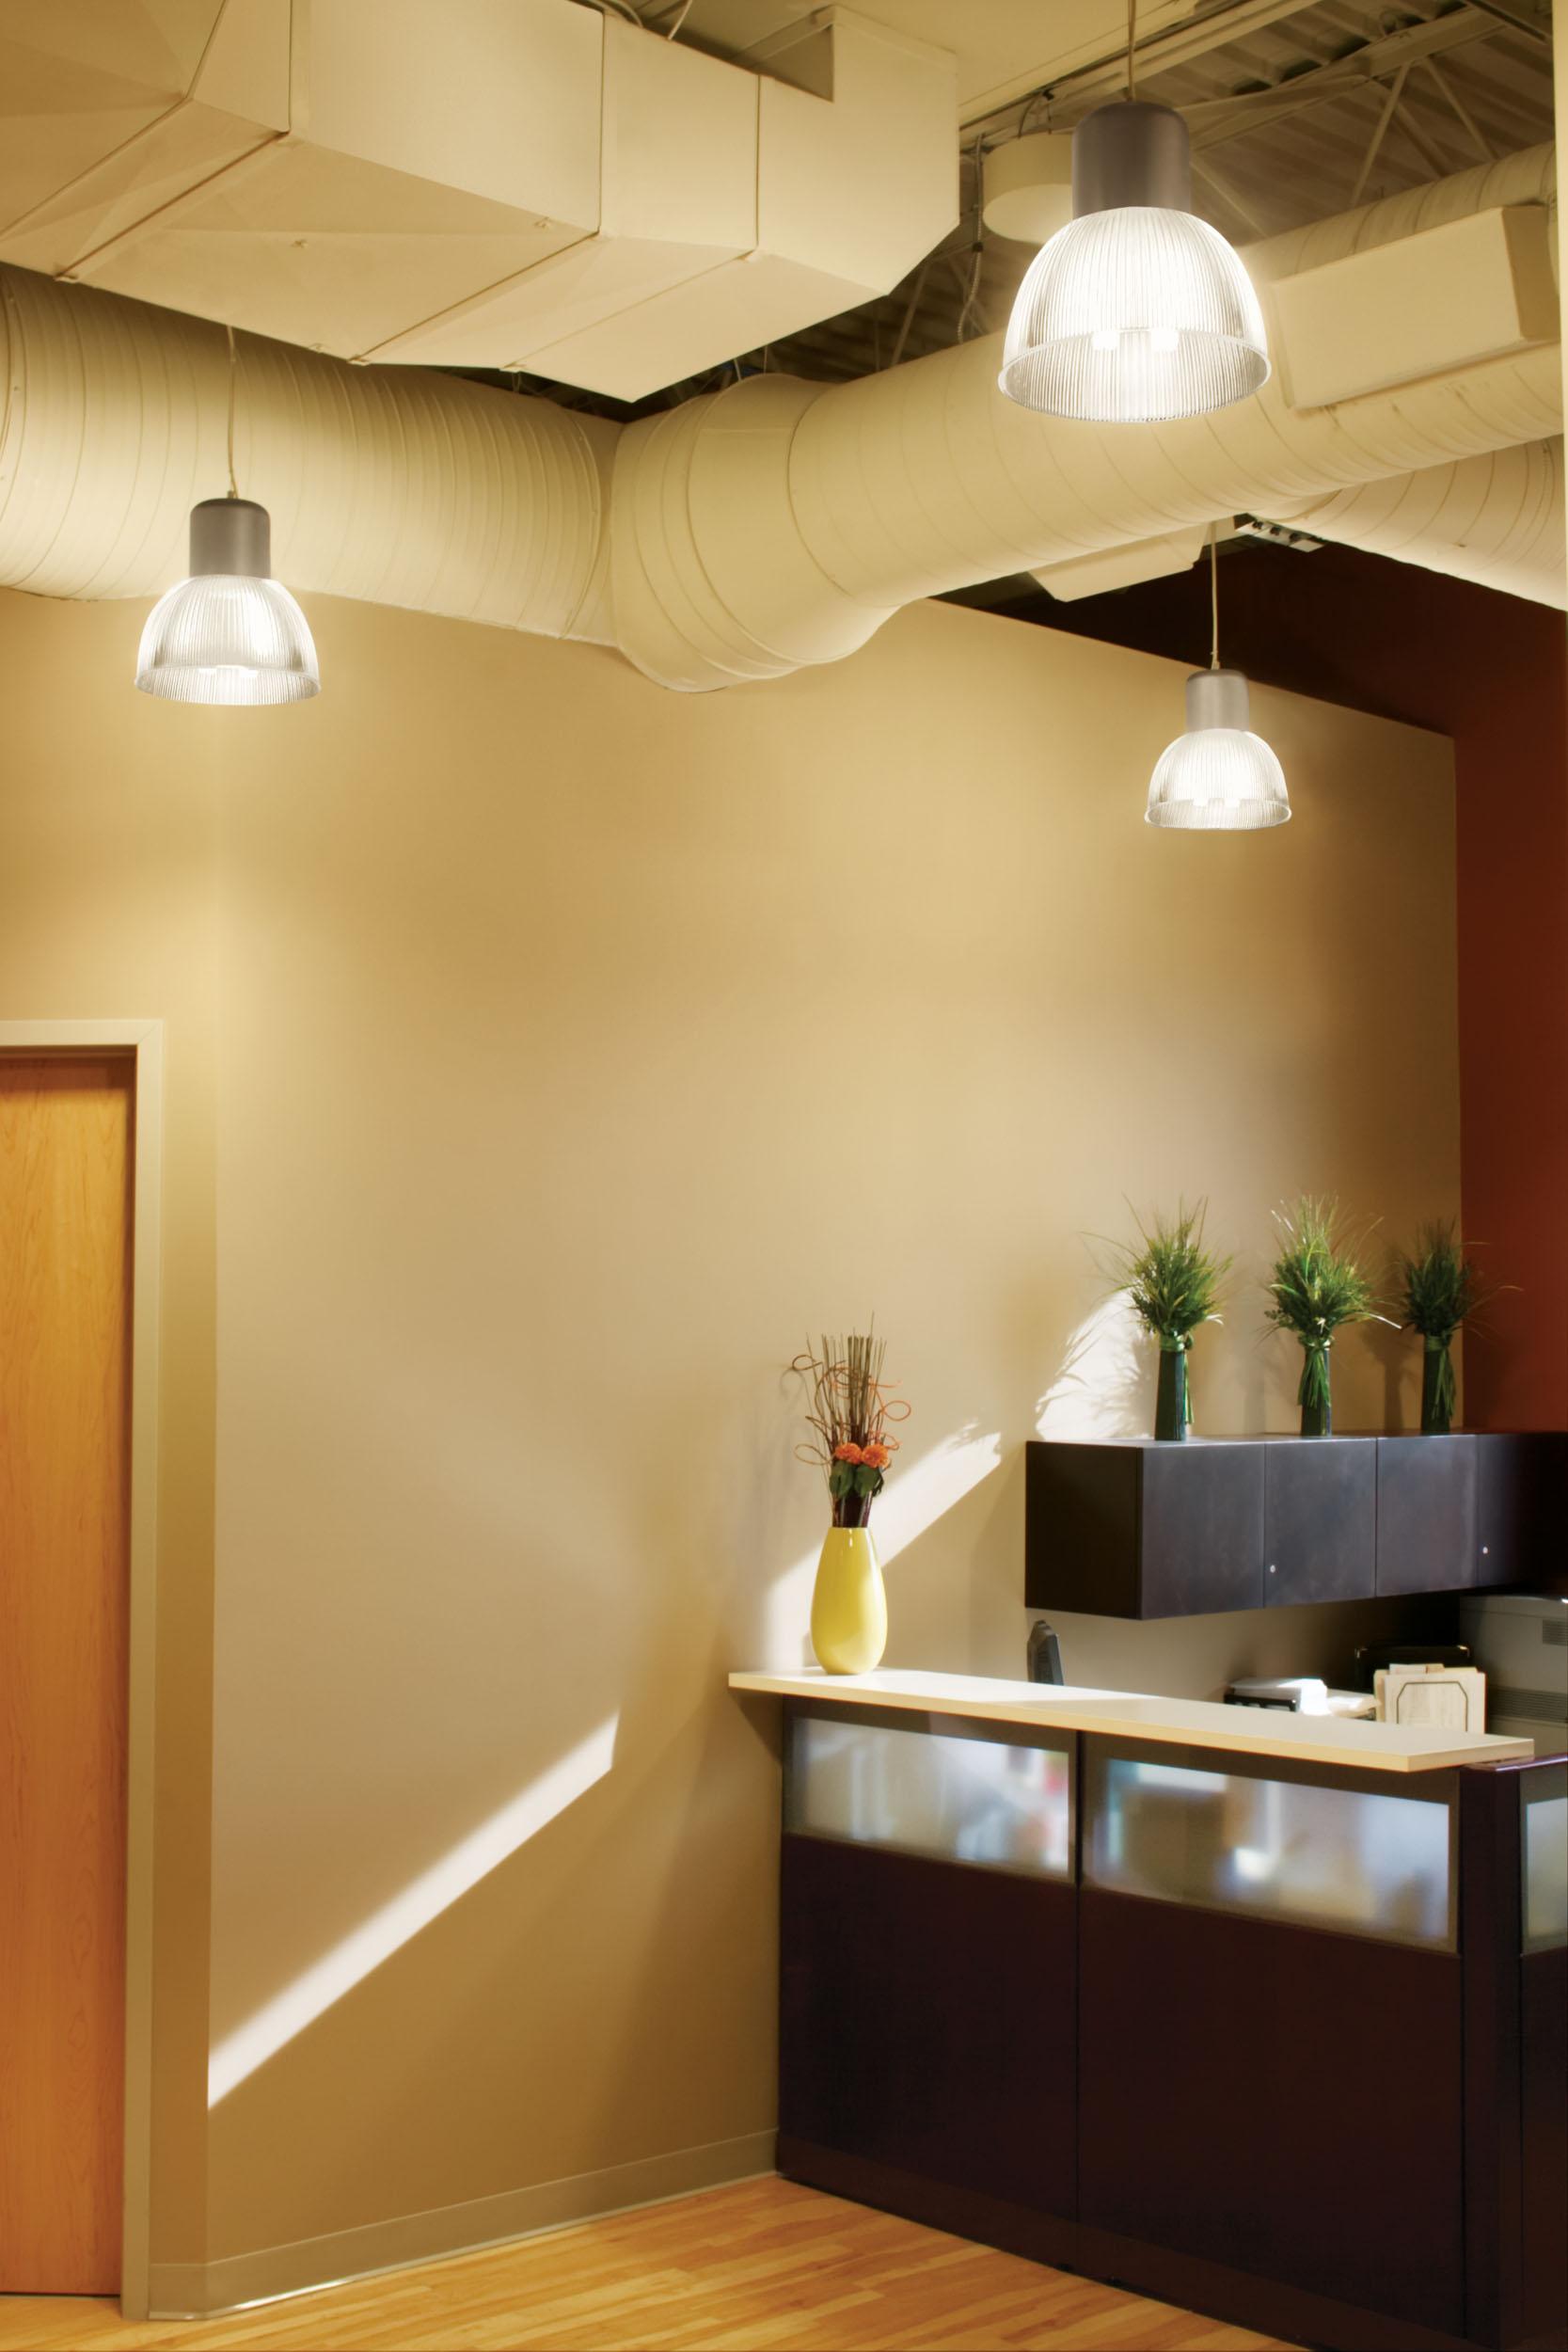 Odyssey™ Pendant OCL Architectural Lighting